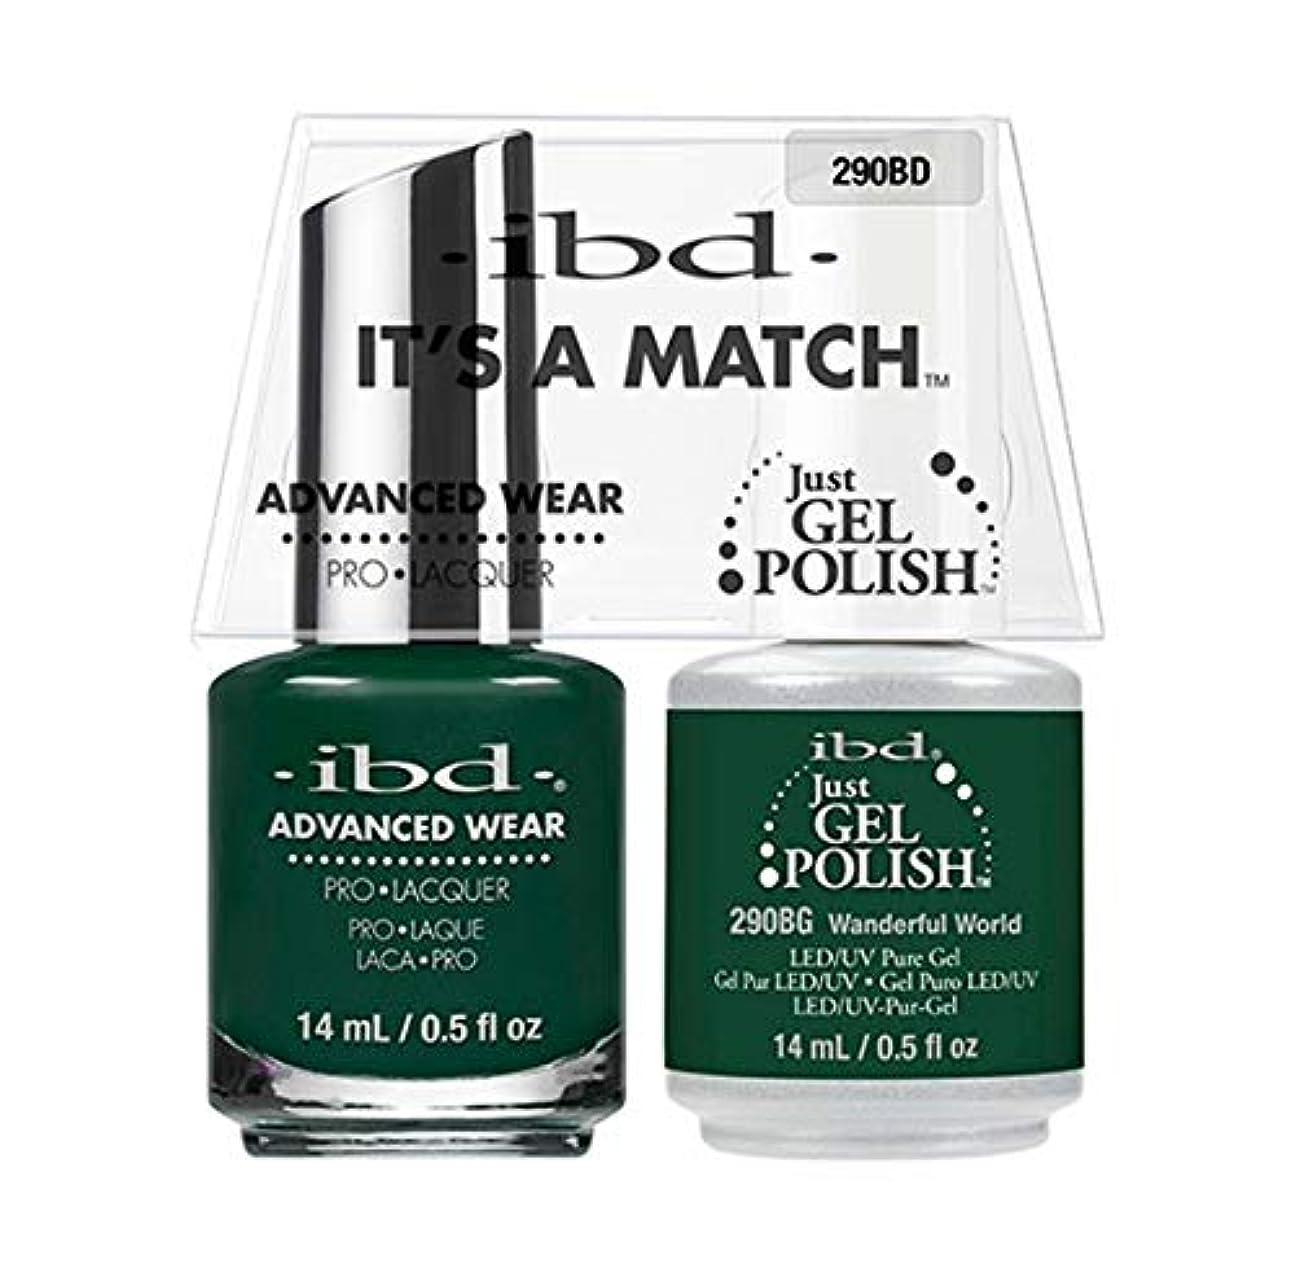 ibd - It's A Match - Duo Pack - Serengeti Soul Collection - Wanderful World - 14ml / 0.5oz each